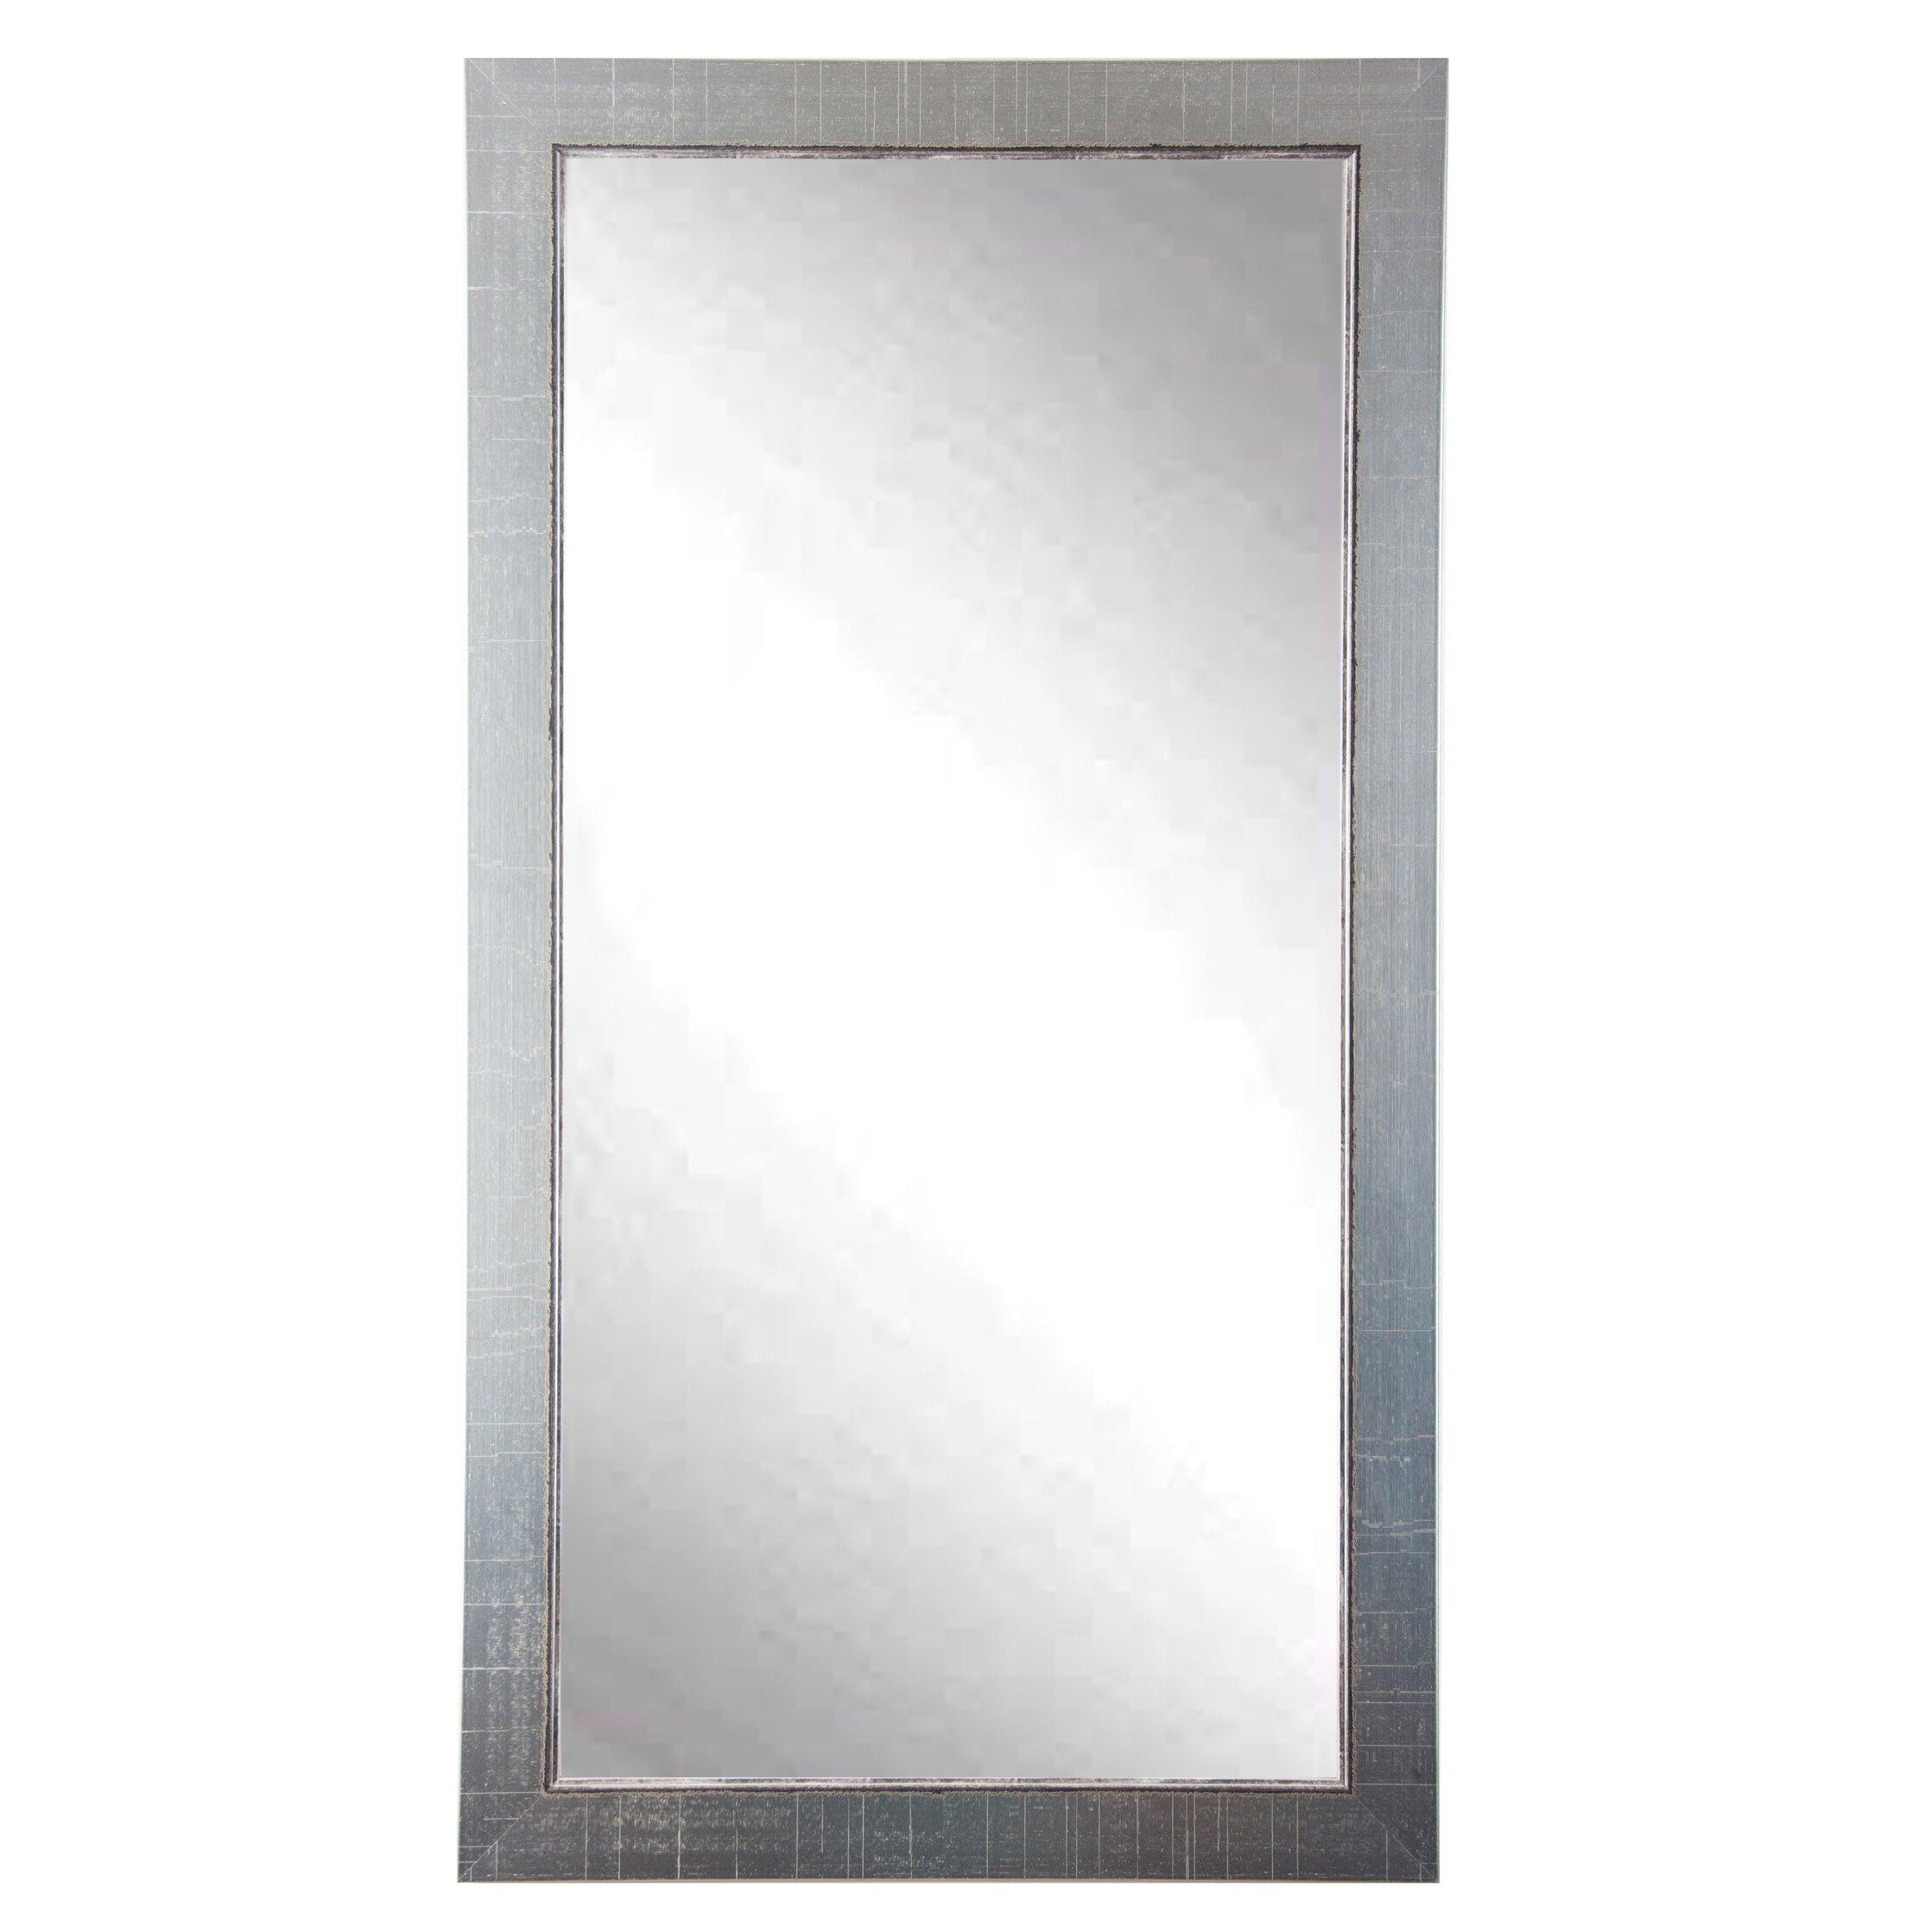 Brandtworksllc silver lined full body floor mirror for Glass floor mirror